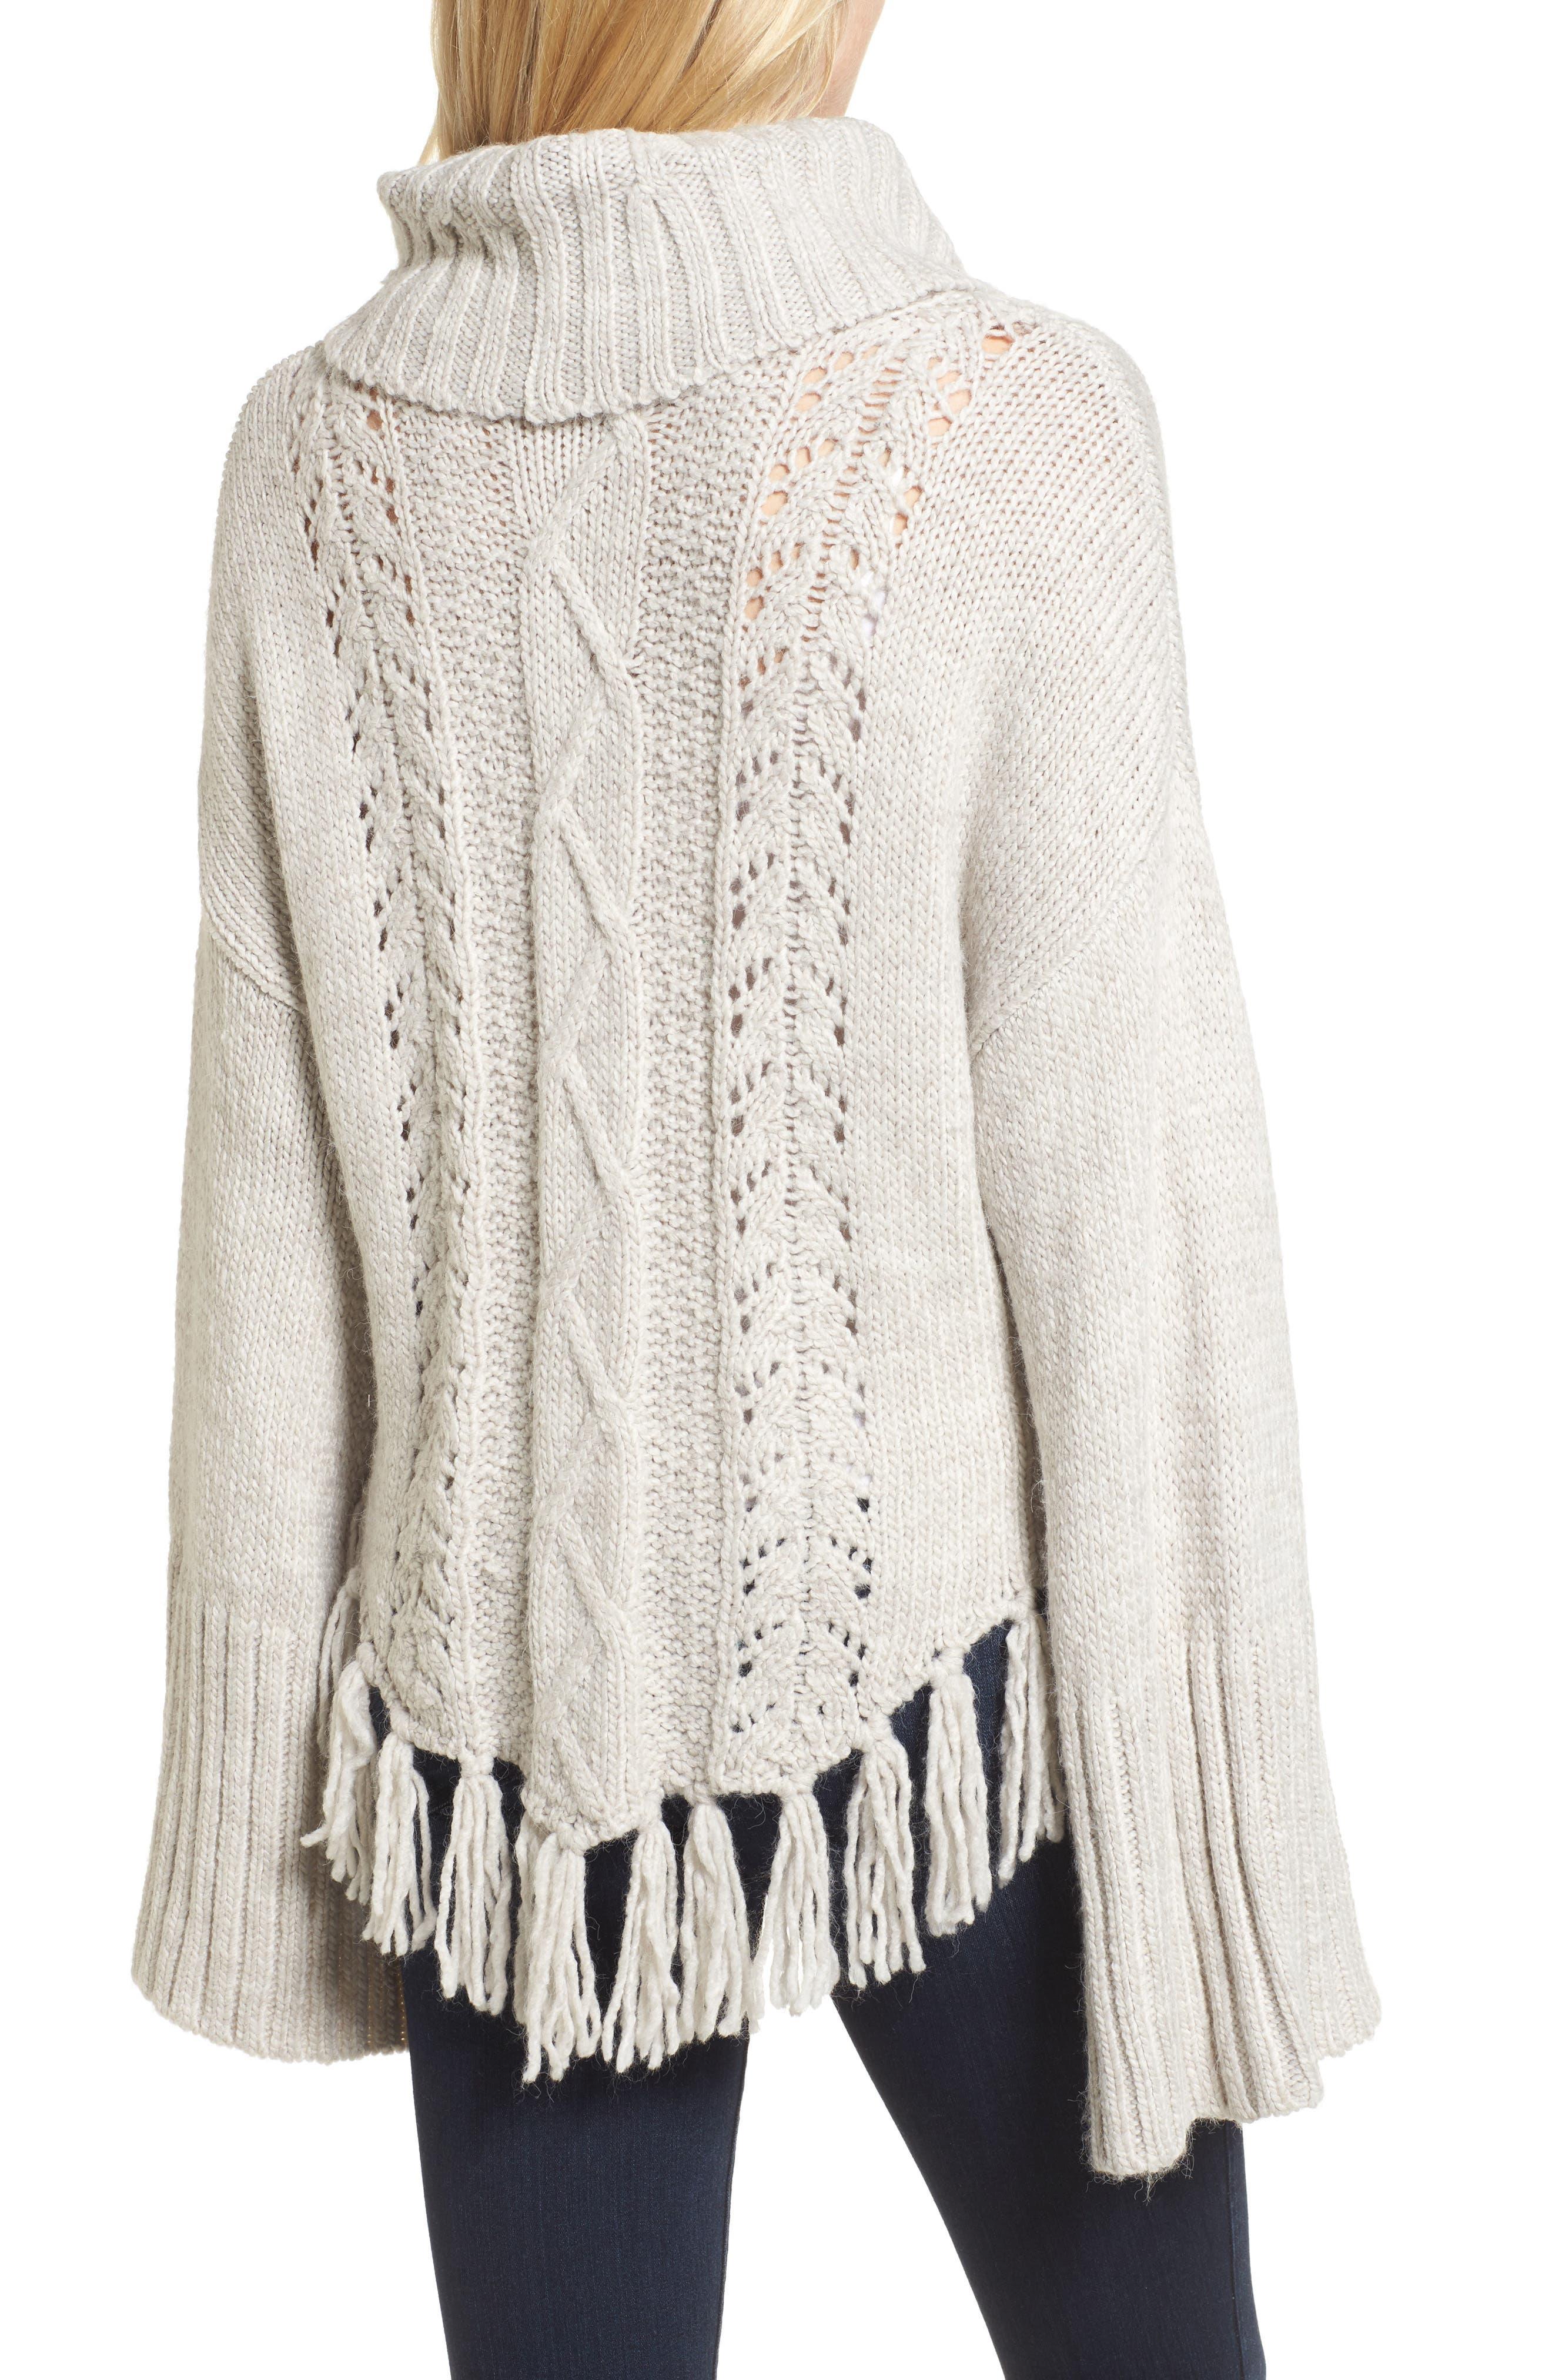 Prilla Fringe Cowl Neck Sweater,                             Alternate thumbnail 2, color,                             Latte